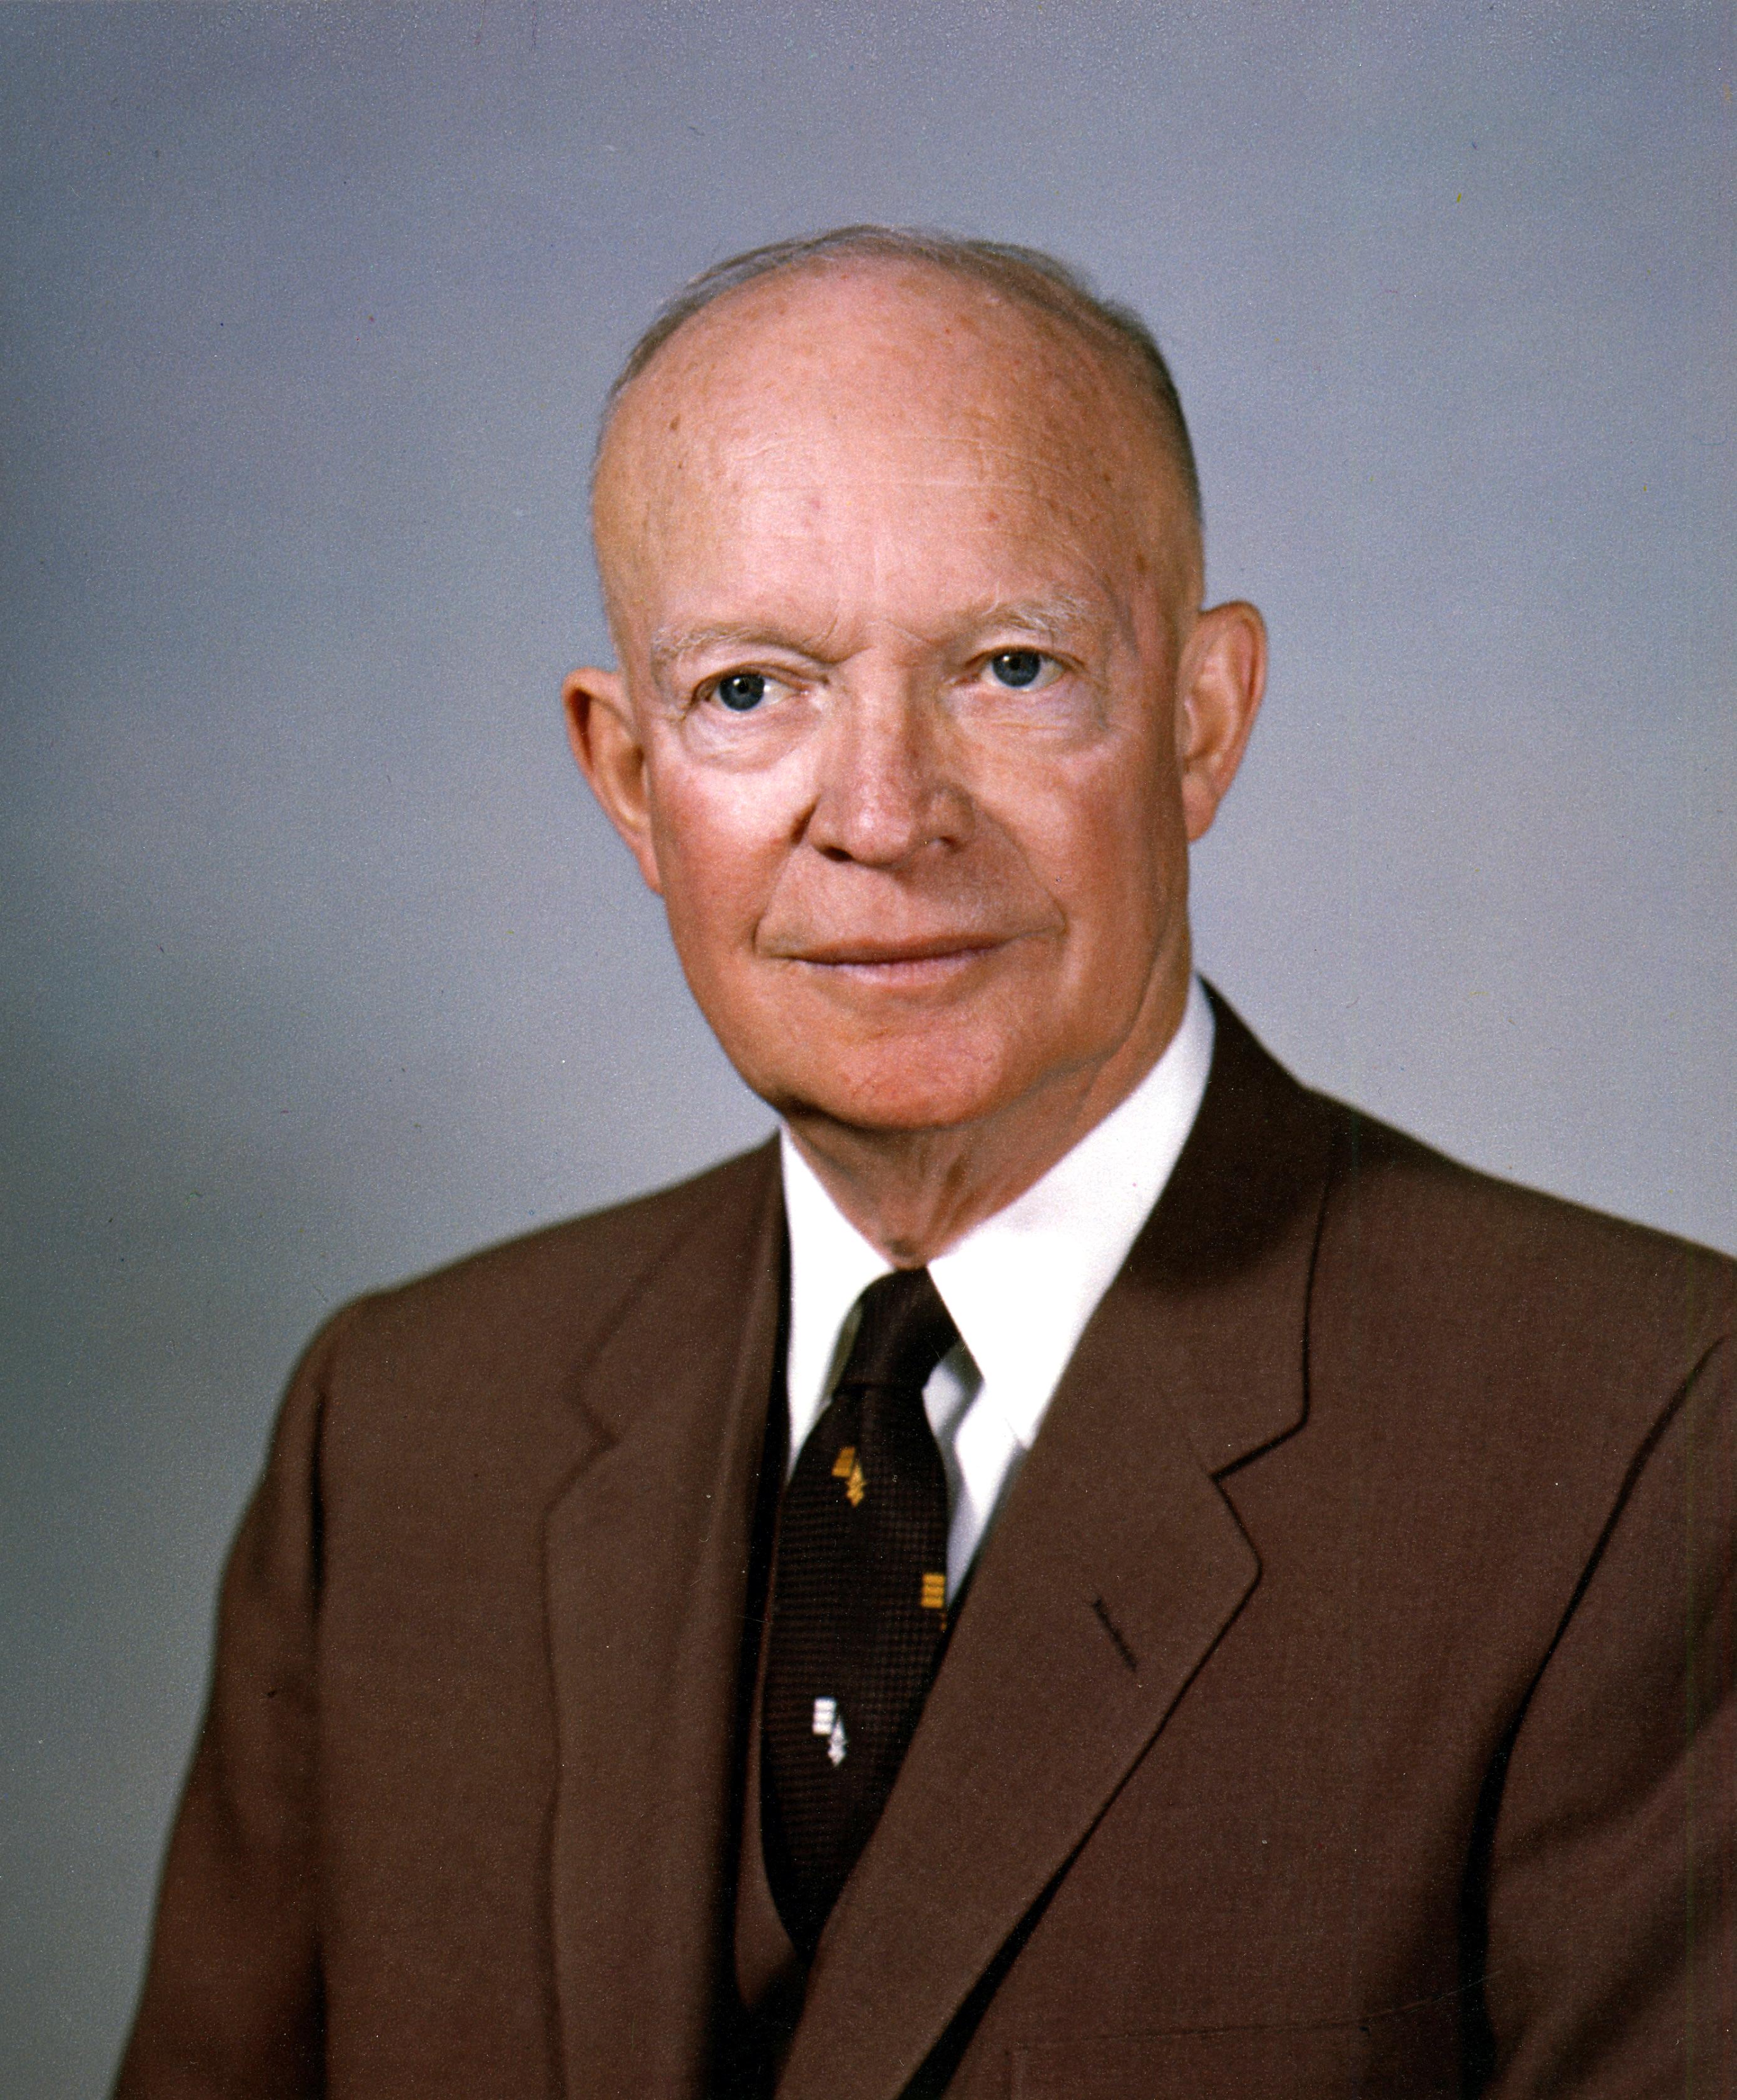 Depiction of Dwight D. Eisenhower